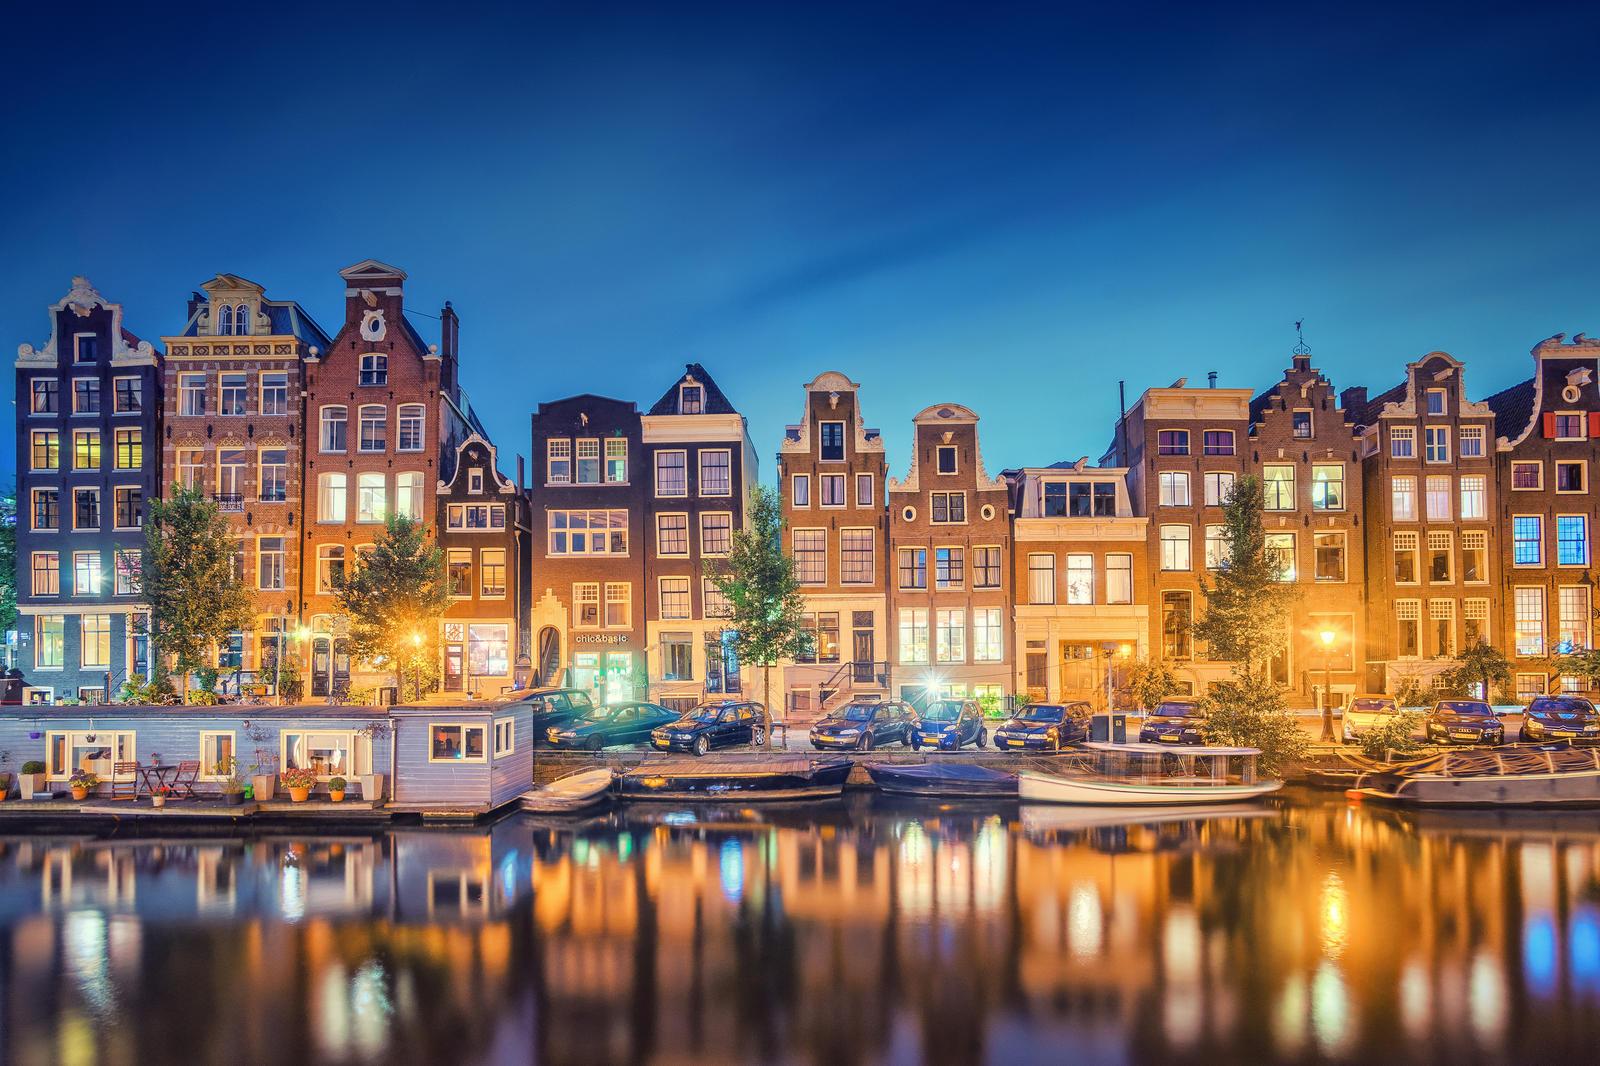 Amsterdam Reflections by Matthias-Haker